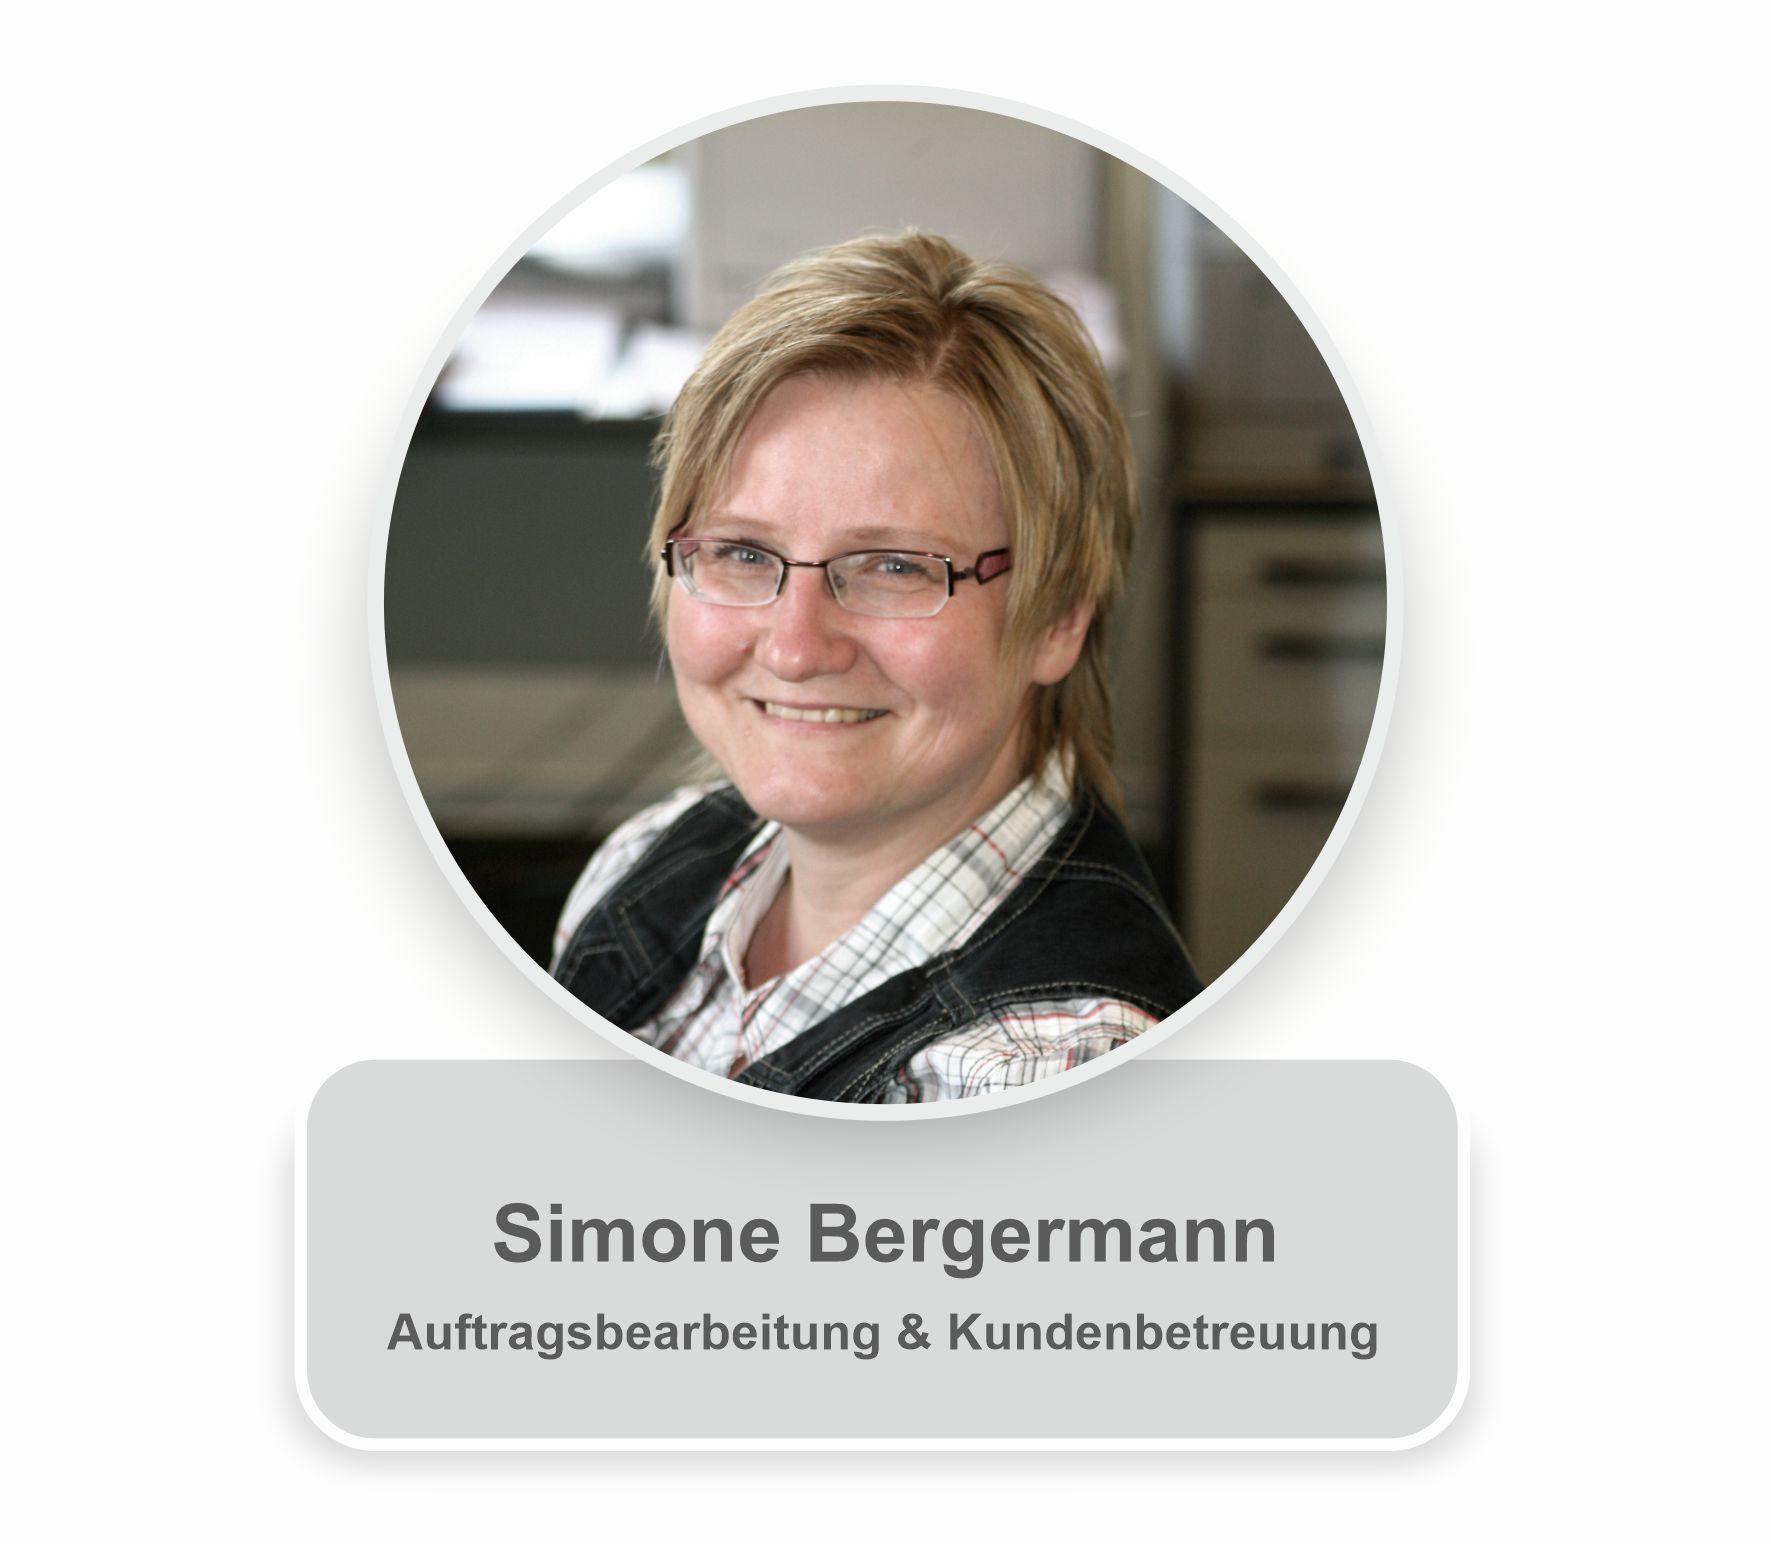 Simone Bergermann